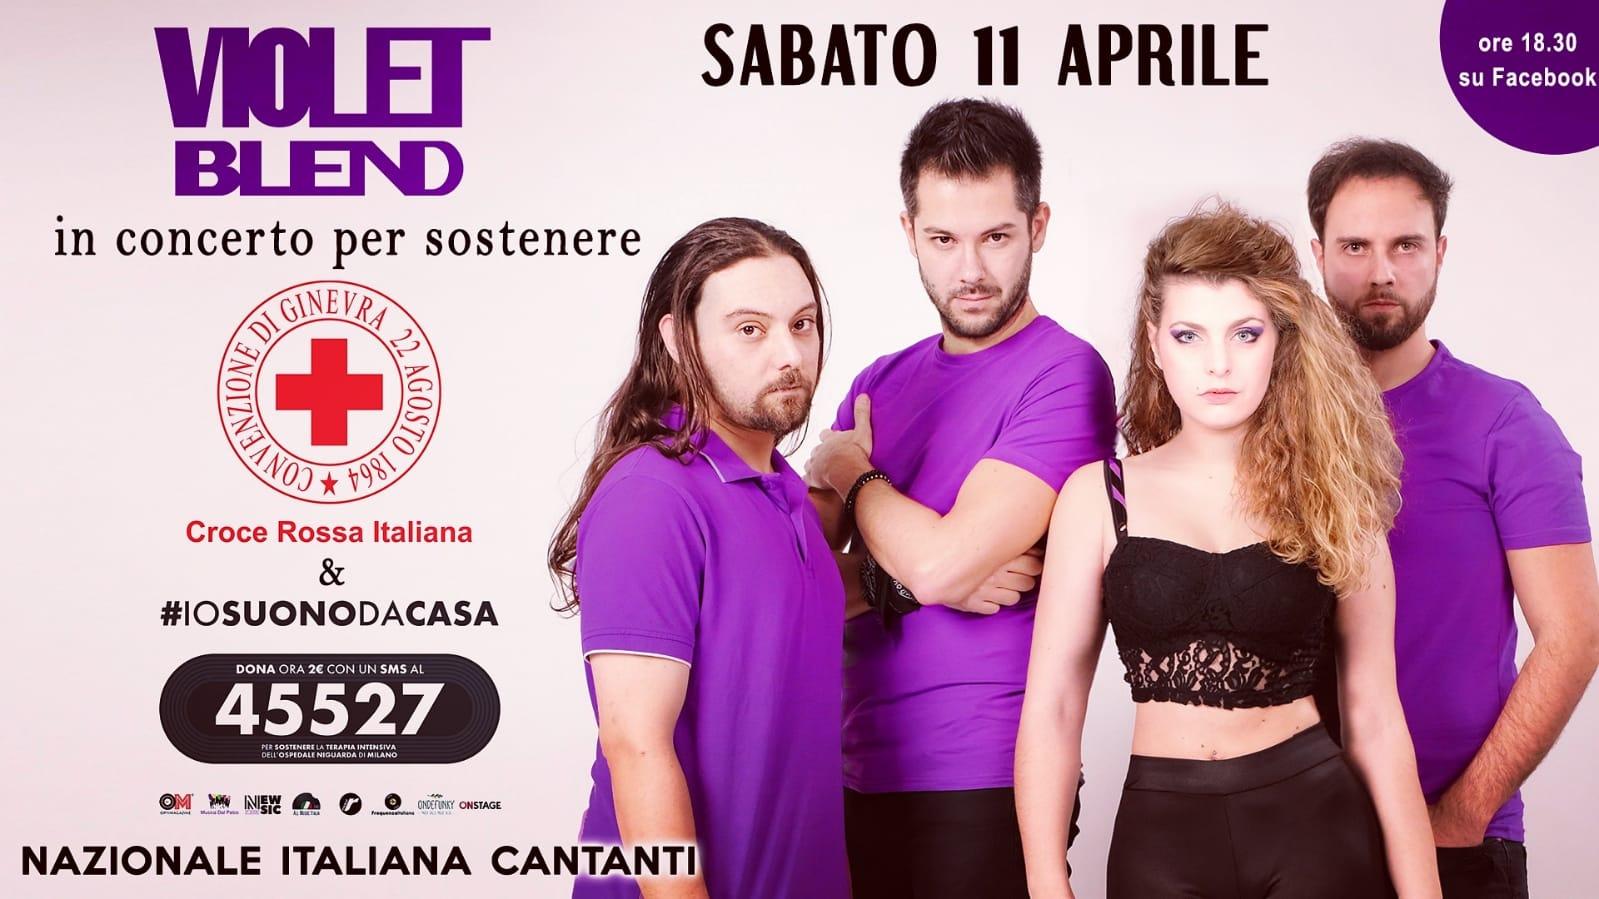 Violet Blend in concerto in streaming per sostenere la Croce Rossa Italiana